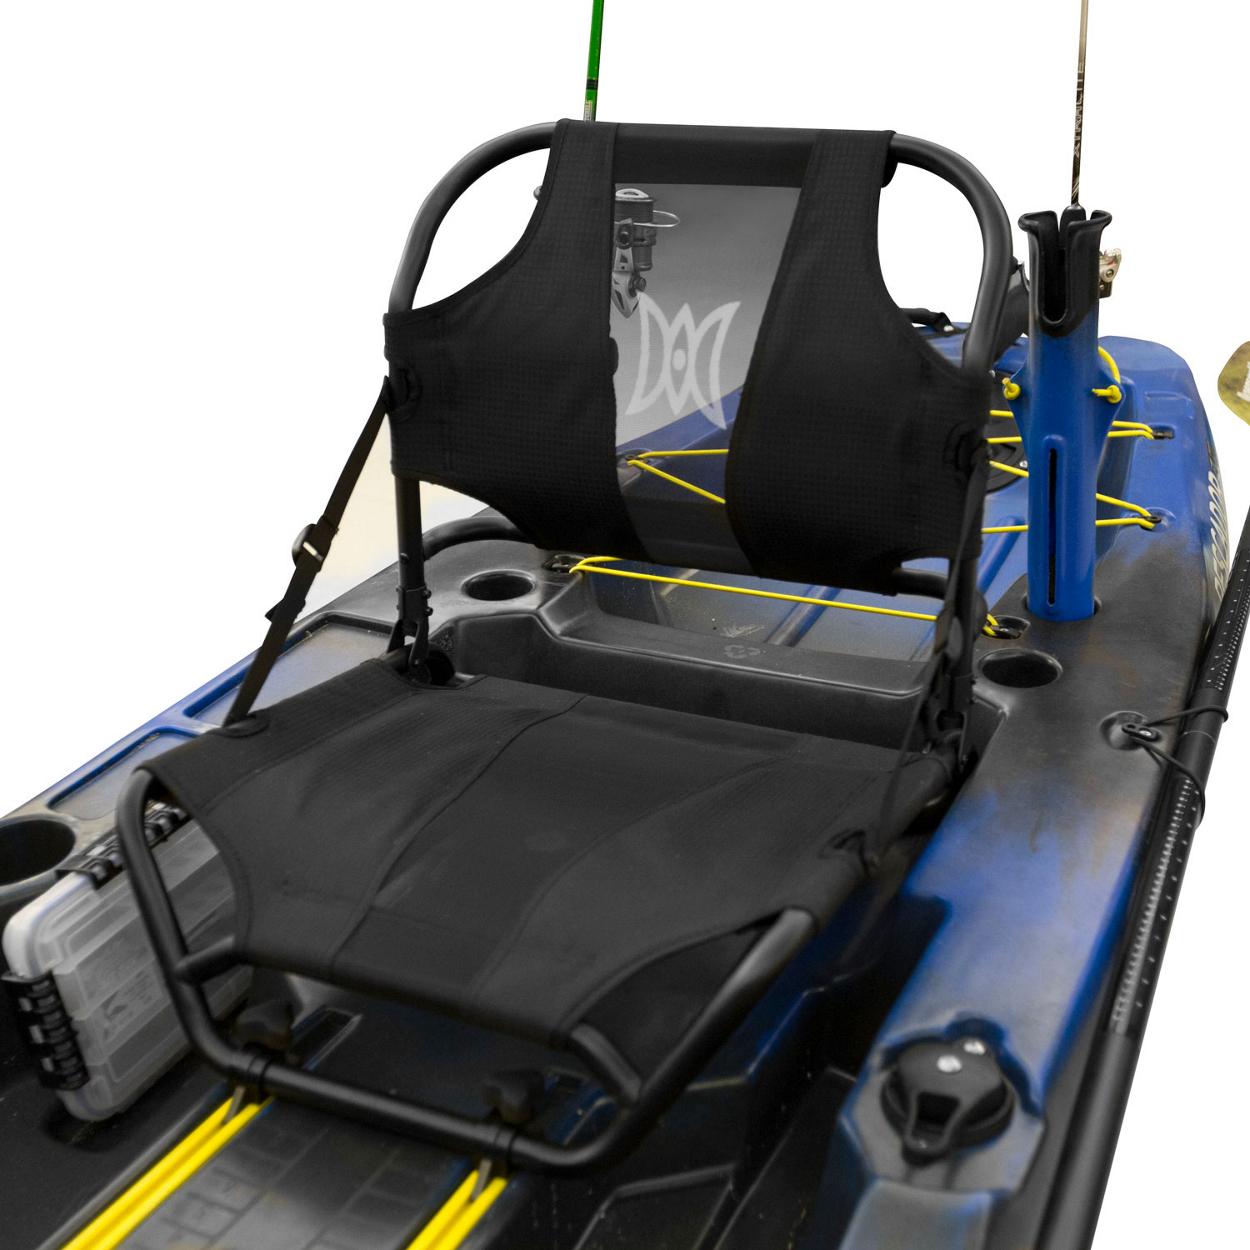 Perception Save On Kayak Seats, Canoe Seats & More at Austin